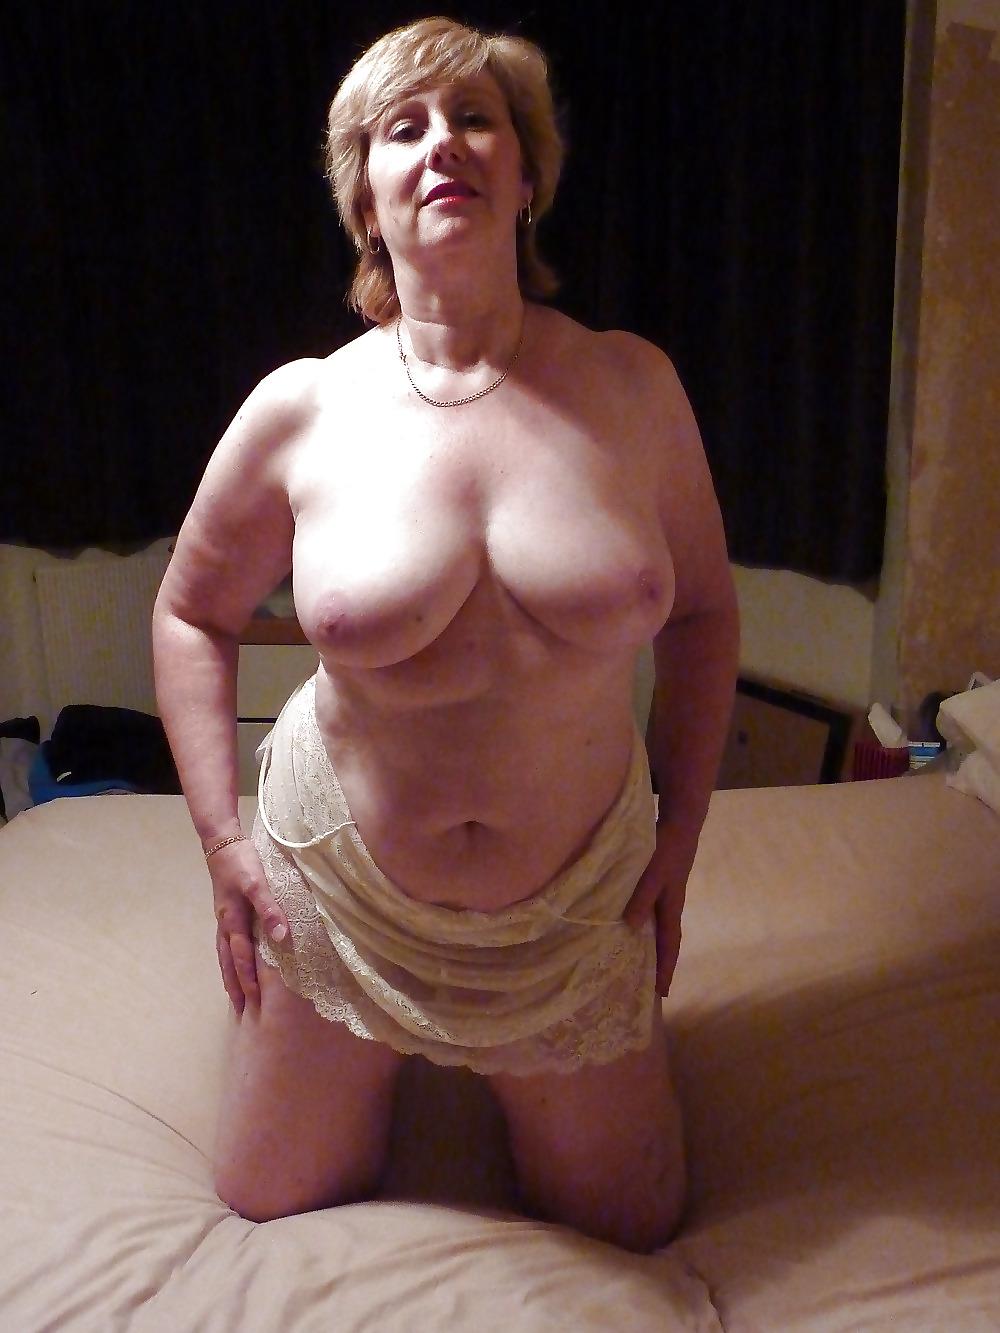 Birmingham prostitute giving good head - 3 part 5